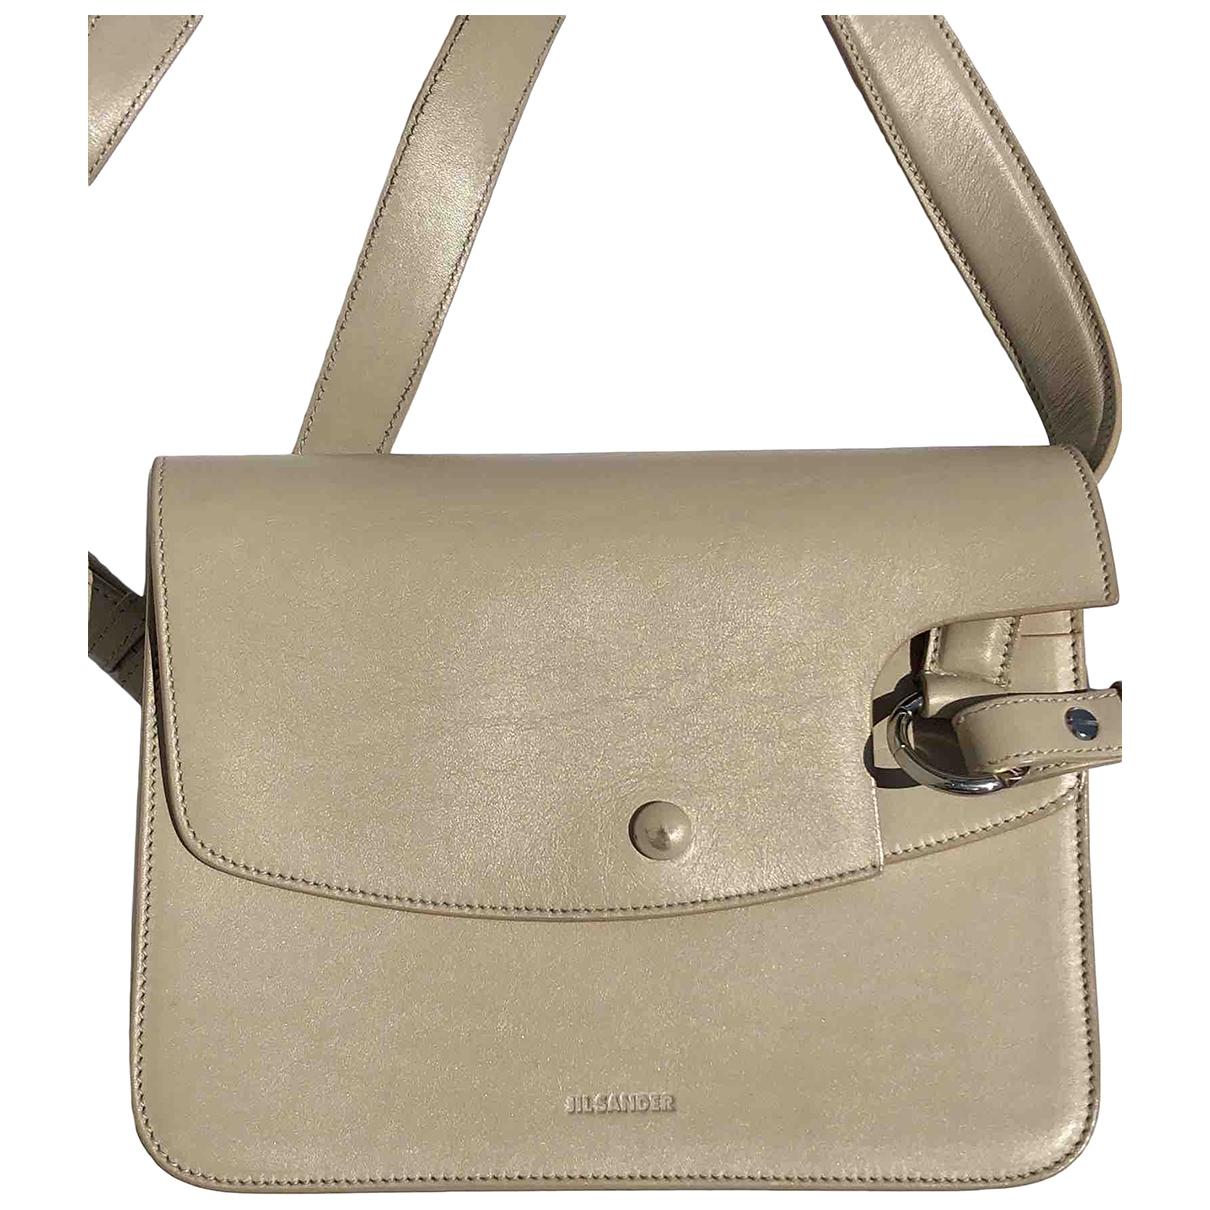 Jil Sander \N Beige Leather handbag for Women \N